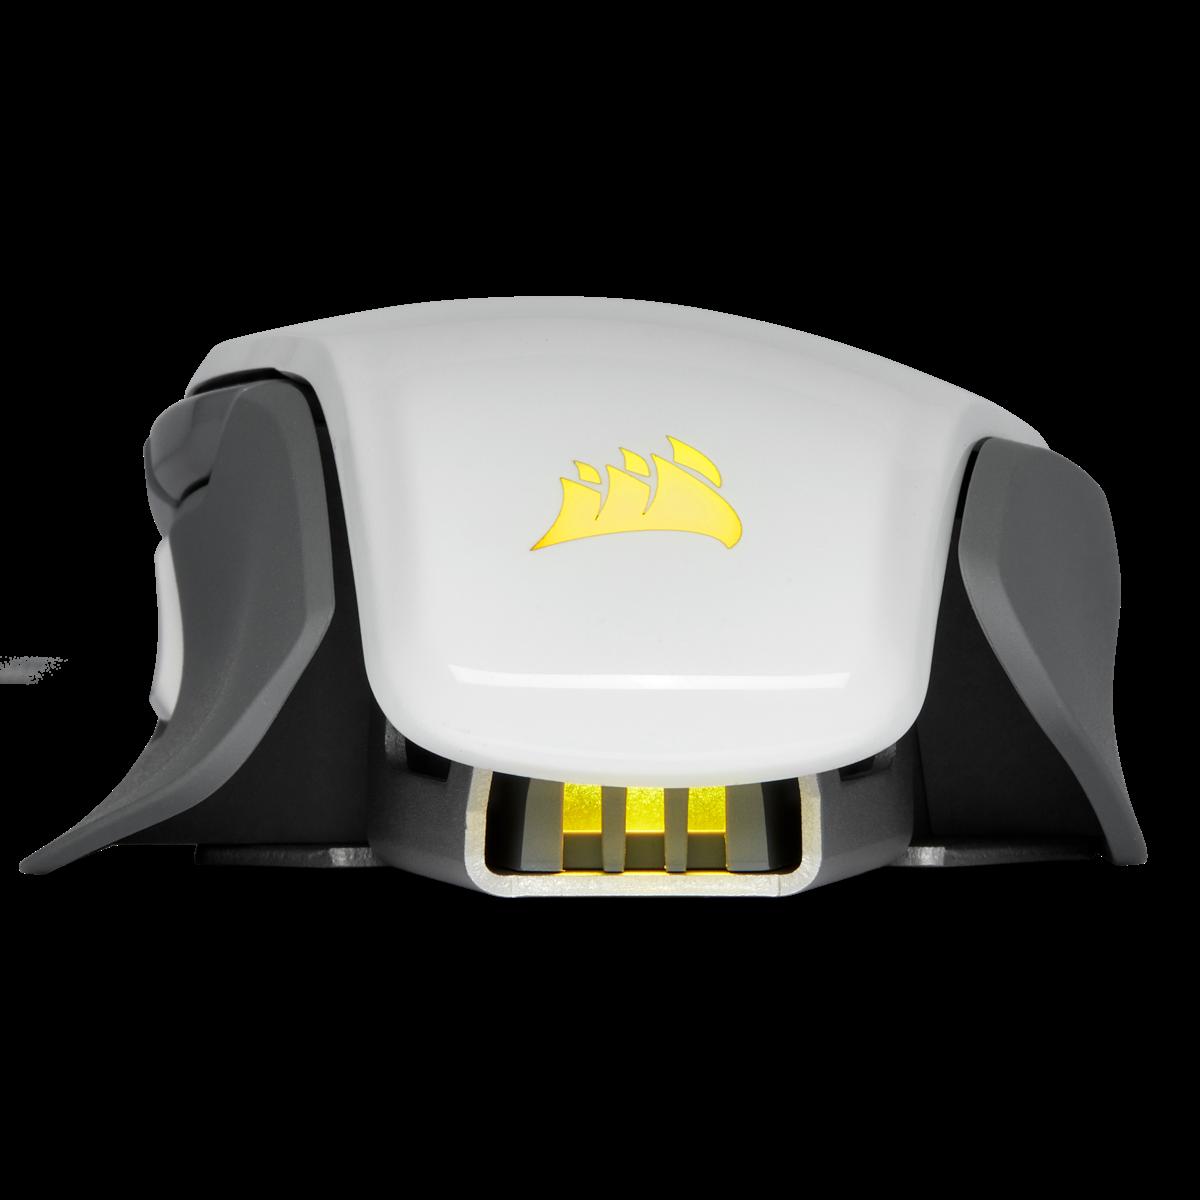 Mouse Corsair Gamer M65 RGB ELITE, 18.000DPI, 8 Botões Programáveis, White, CH-9309111-NA